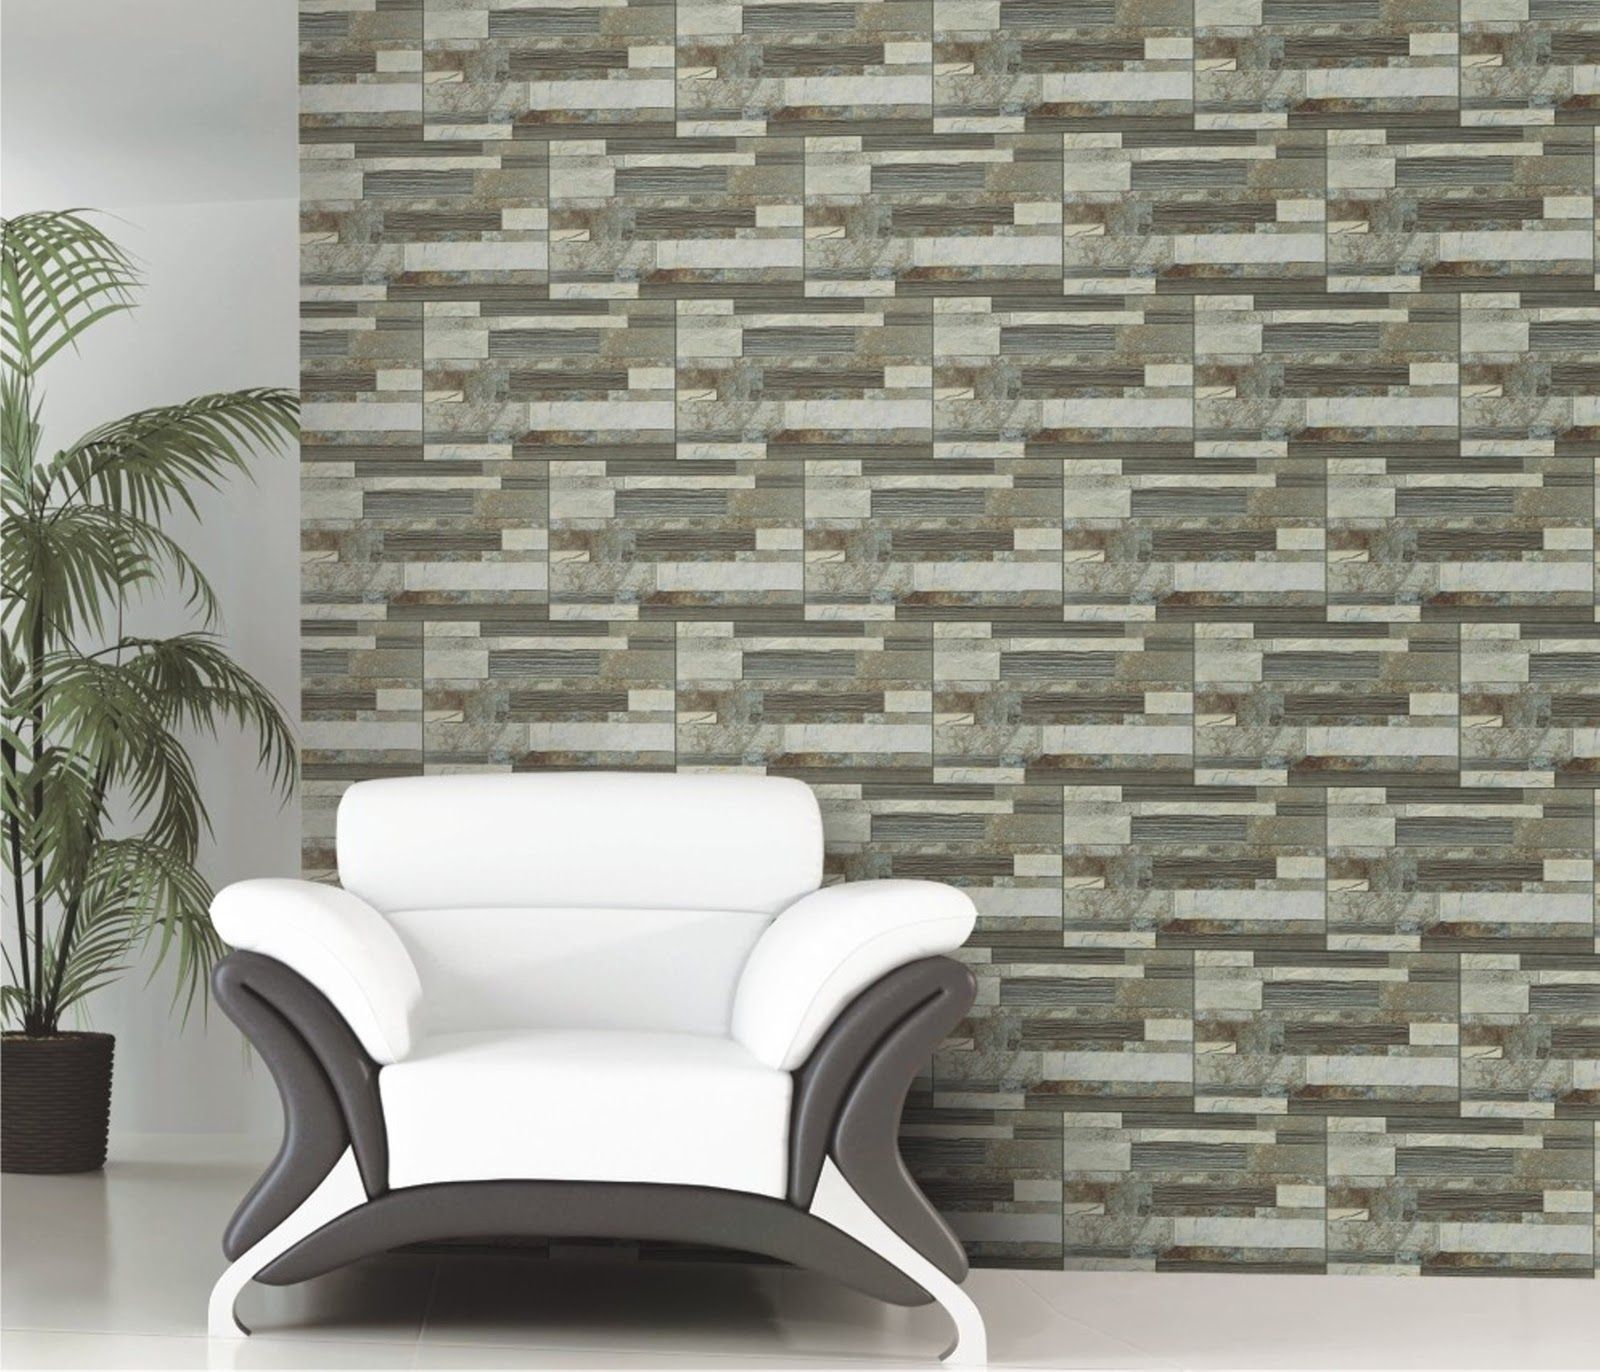 Front Elevation Tiles White : Rak elevation tiles joy studio design gallery best